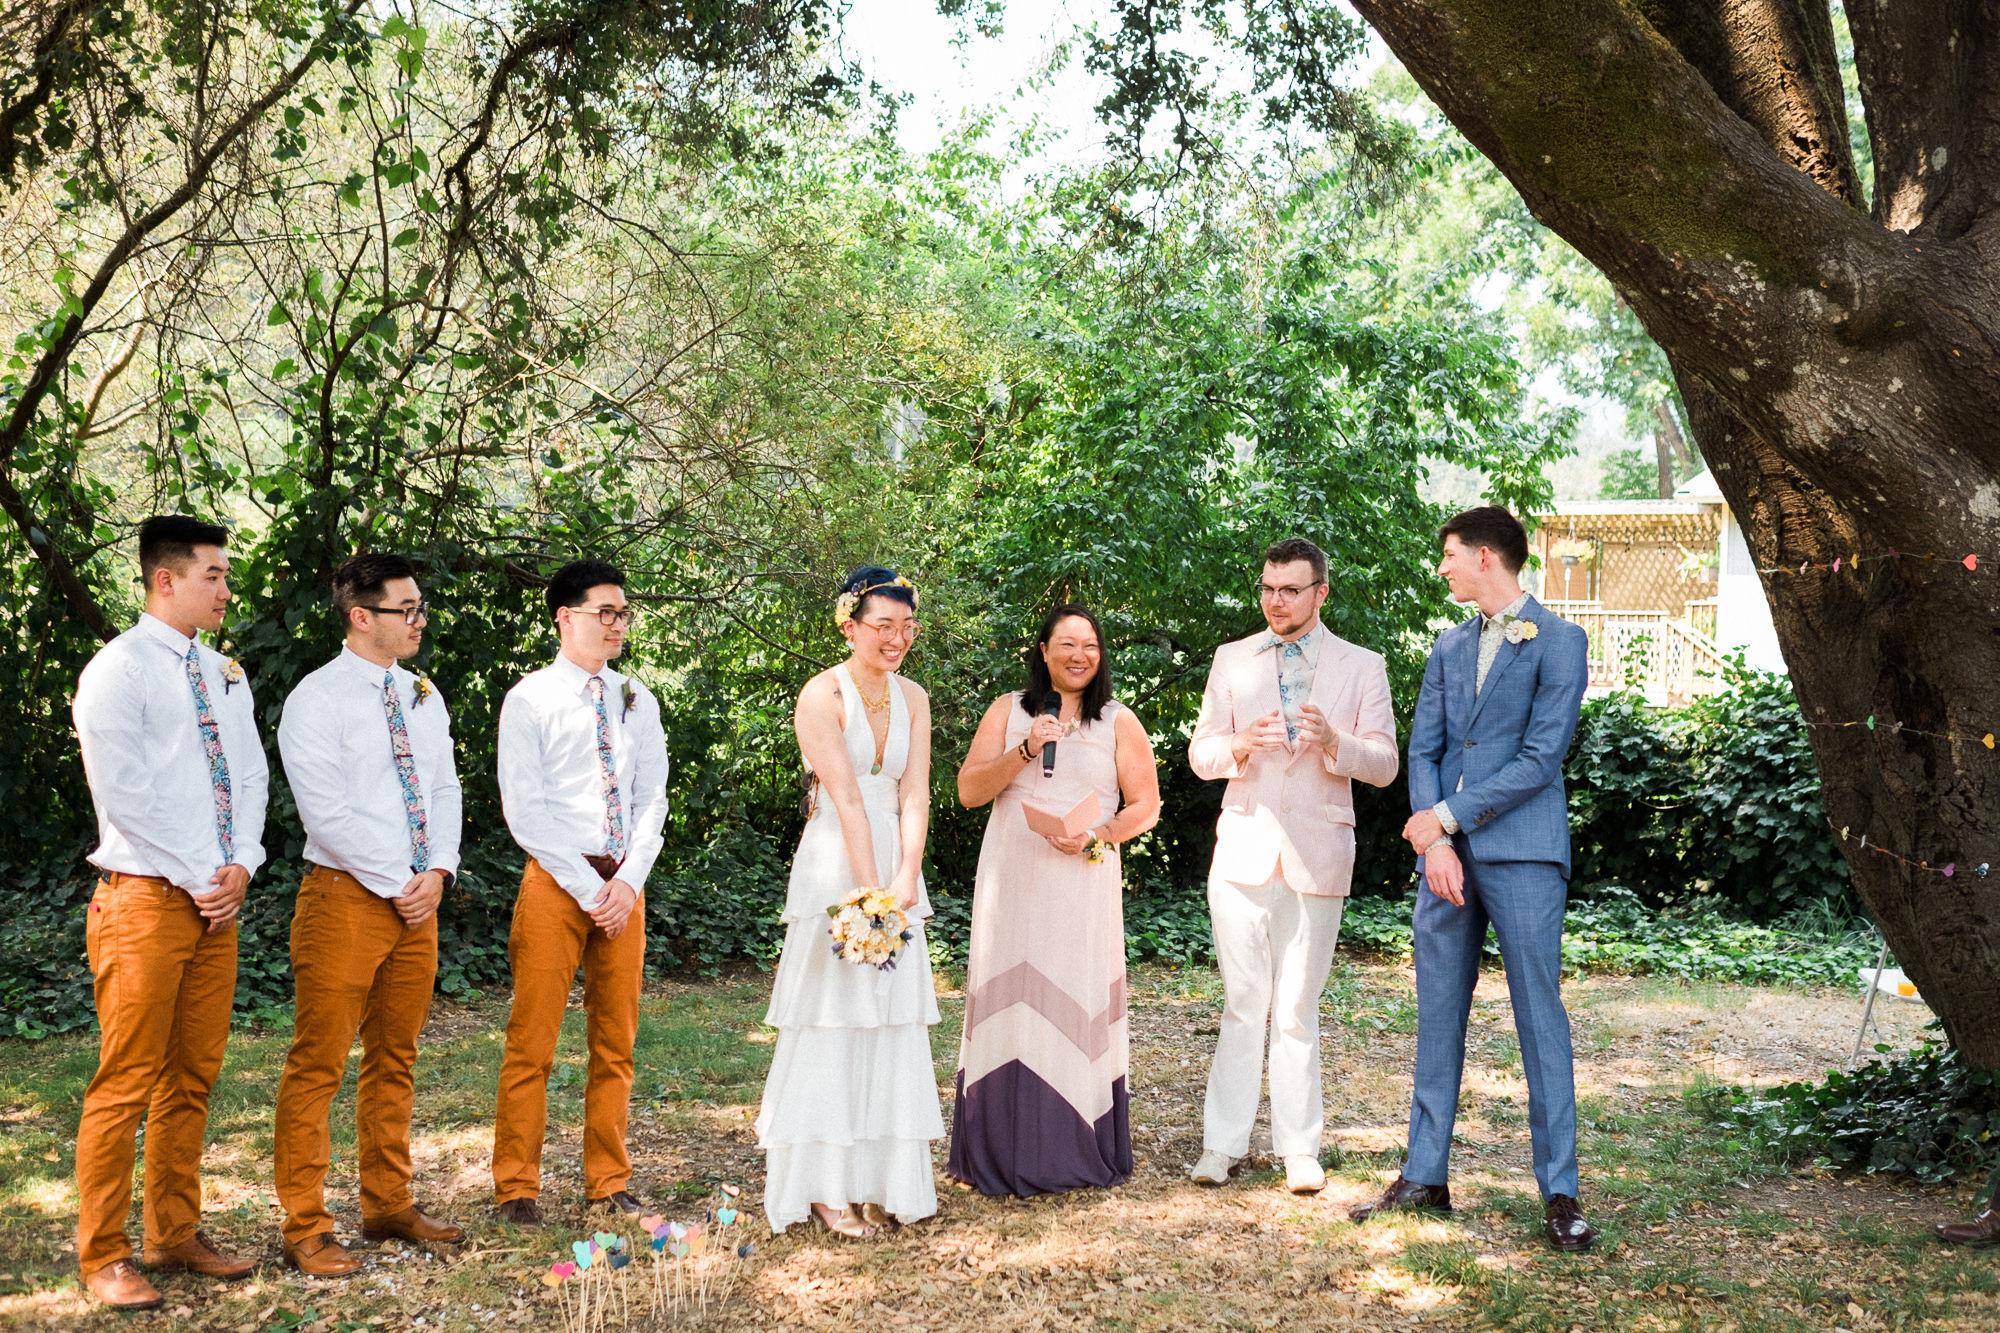 Monte Rio Community Center Wedding 032.jpg